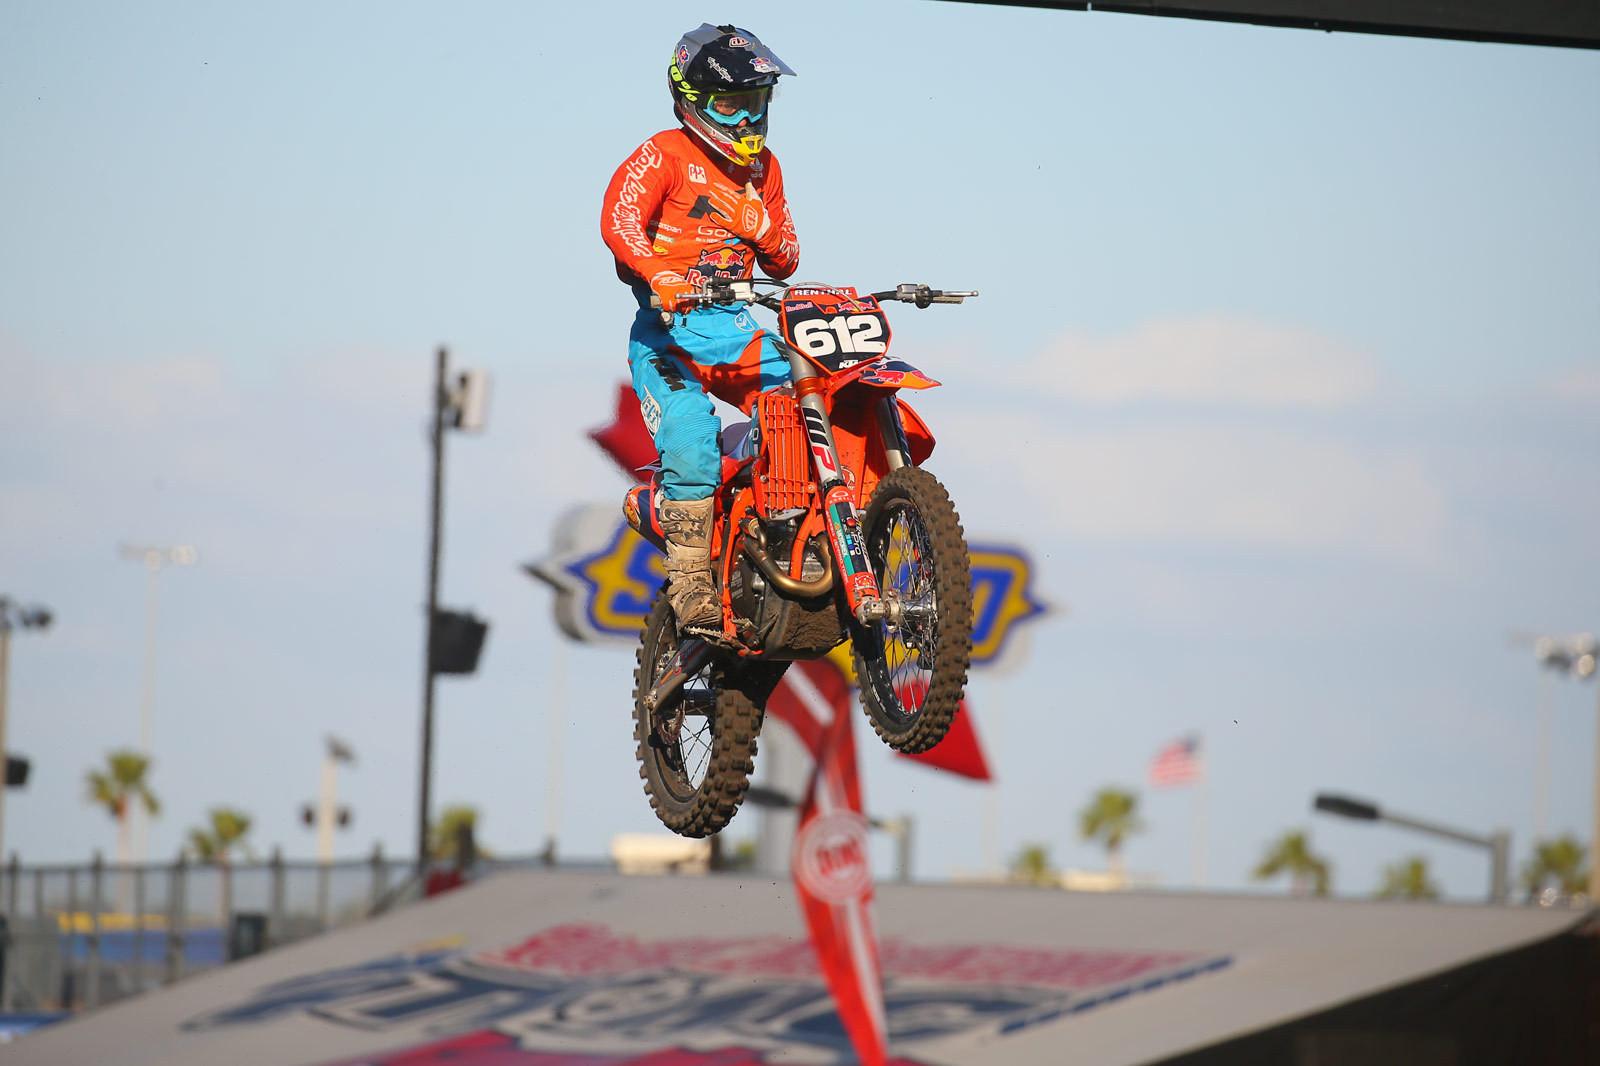 Mitchell Falk - 2016 Ricky Carmichael Amateur Supercross - Motocross Pictures - Vital MX